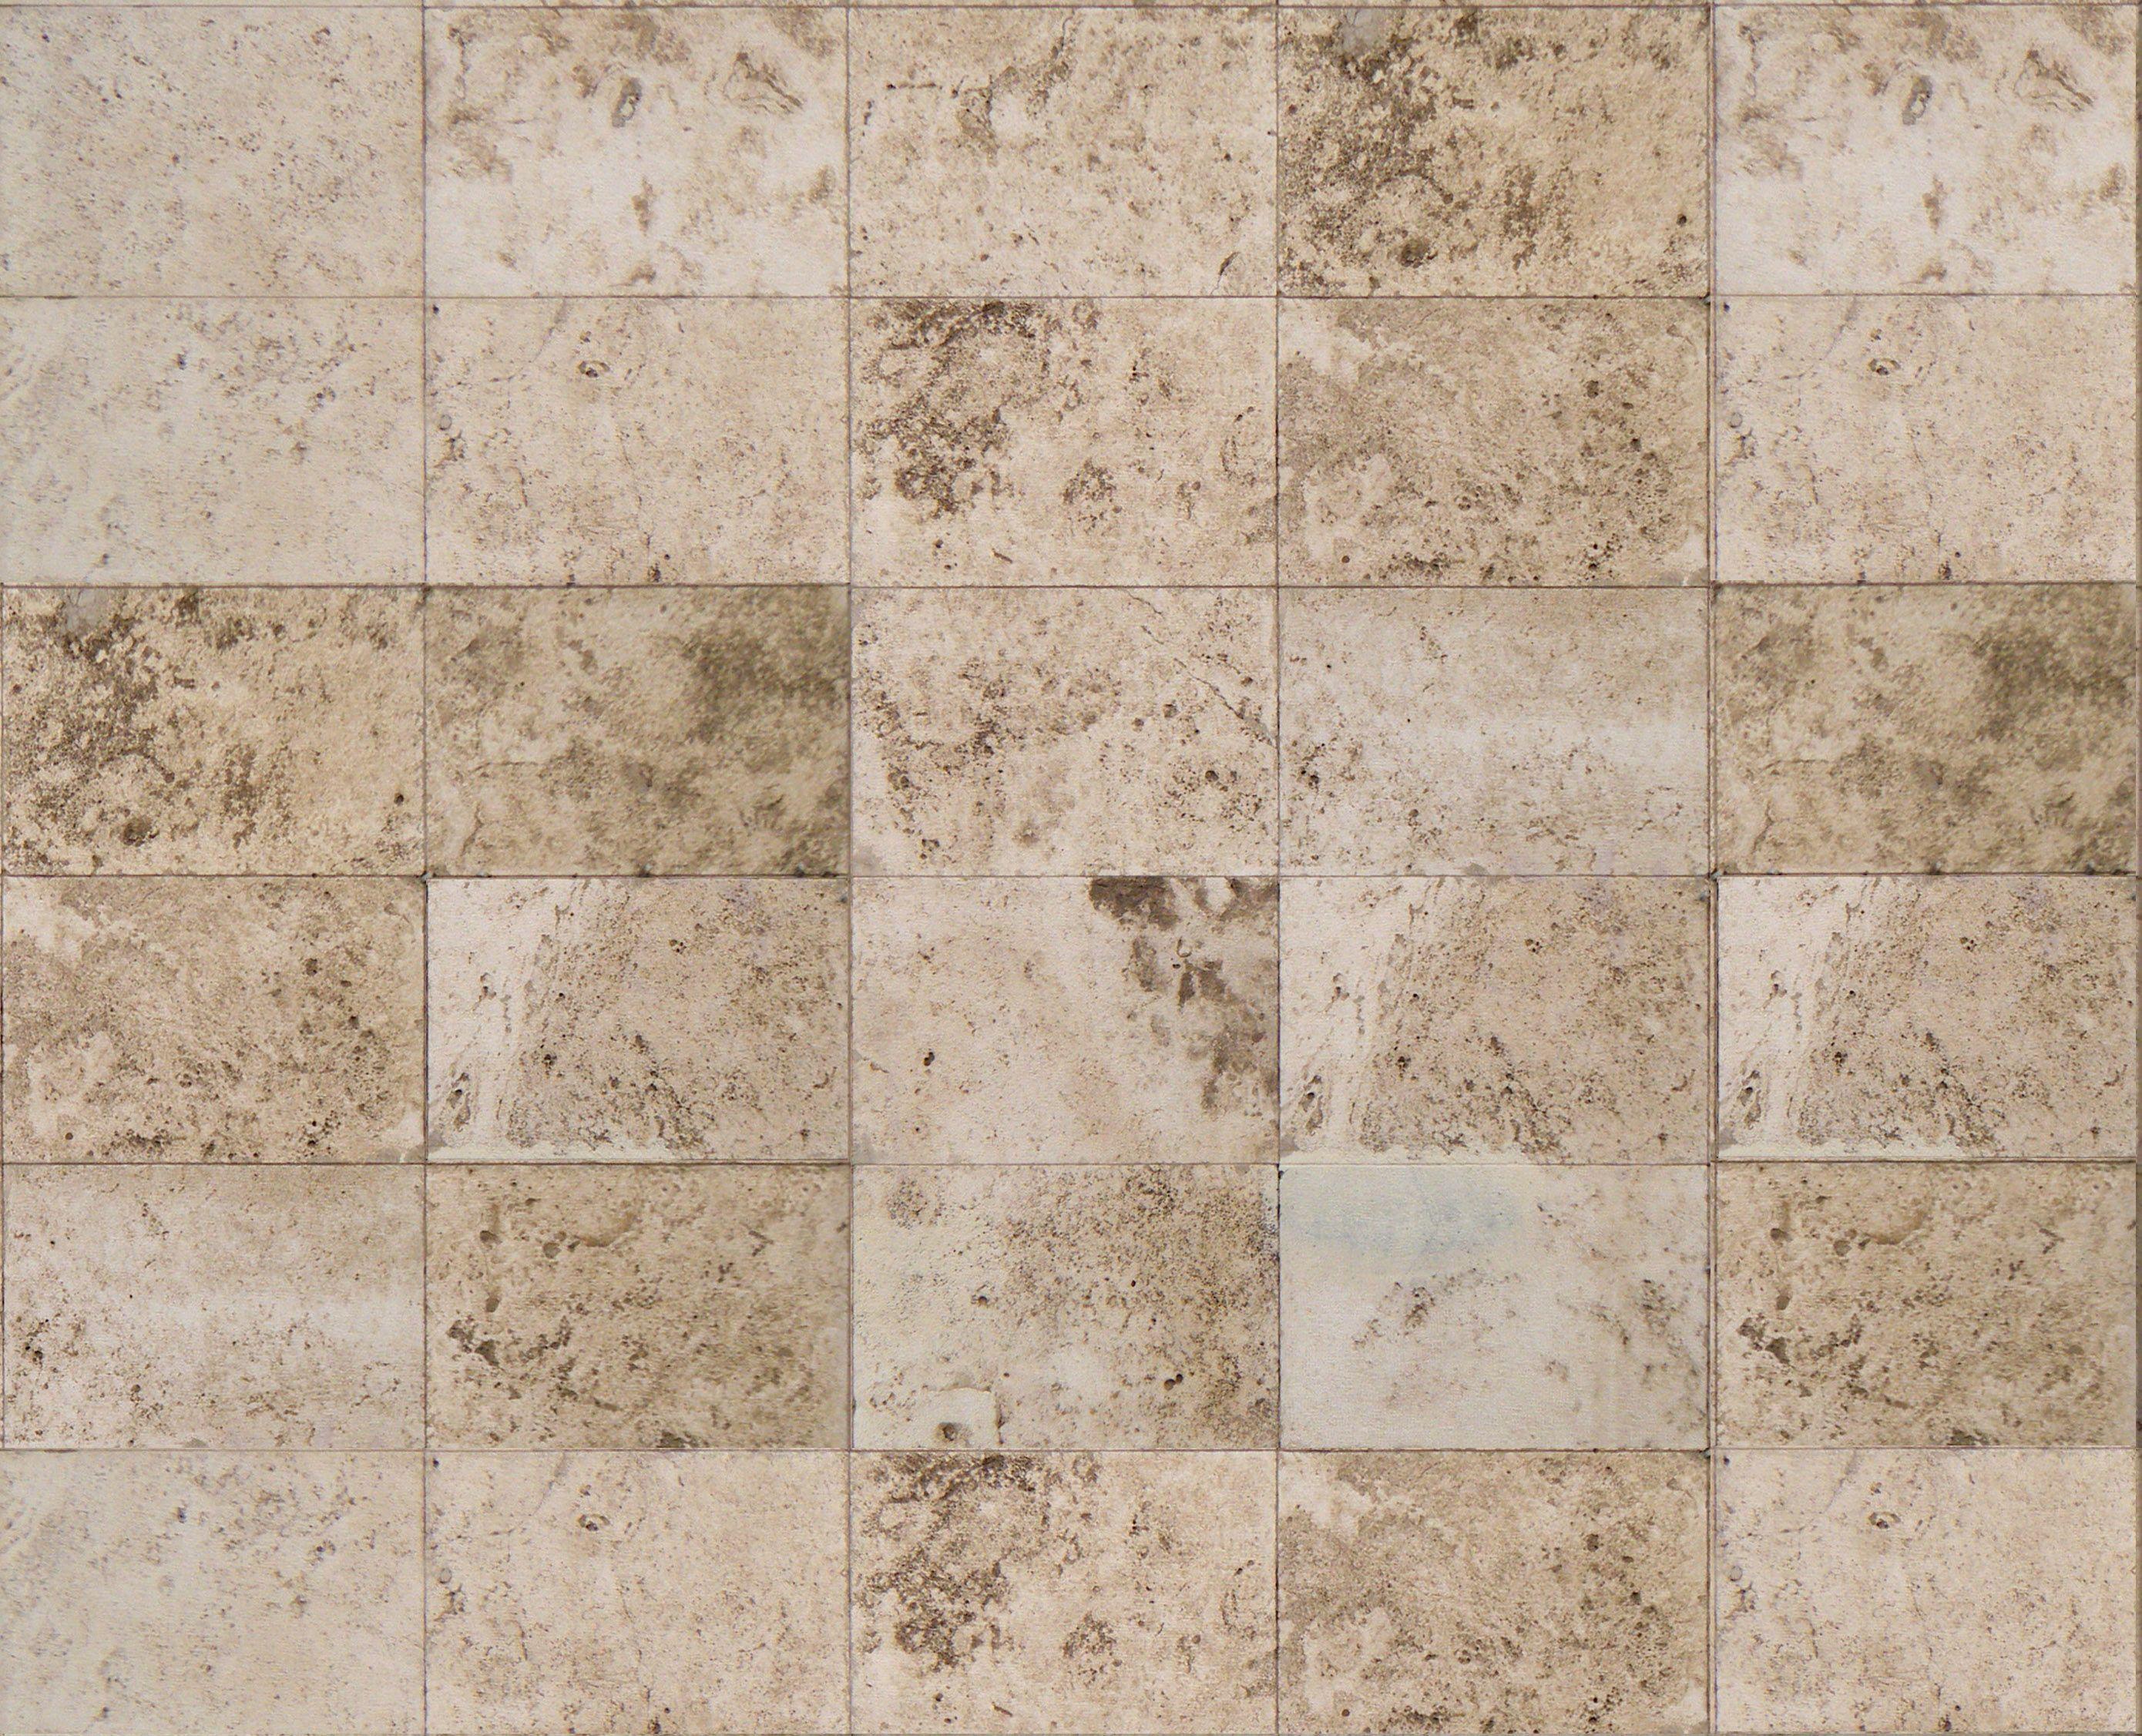 stone tile flooring tiles texture